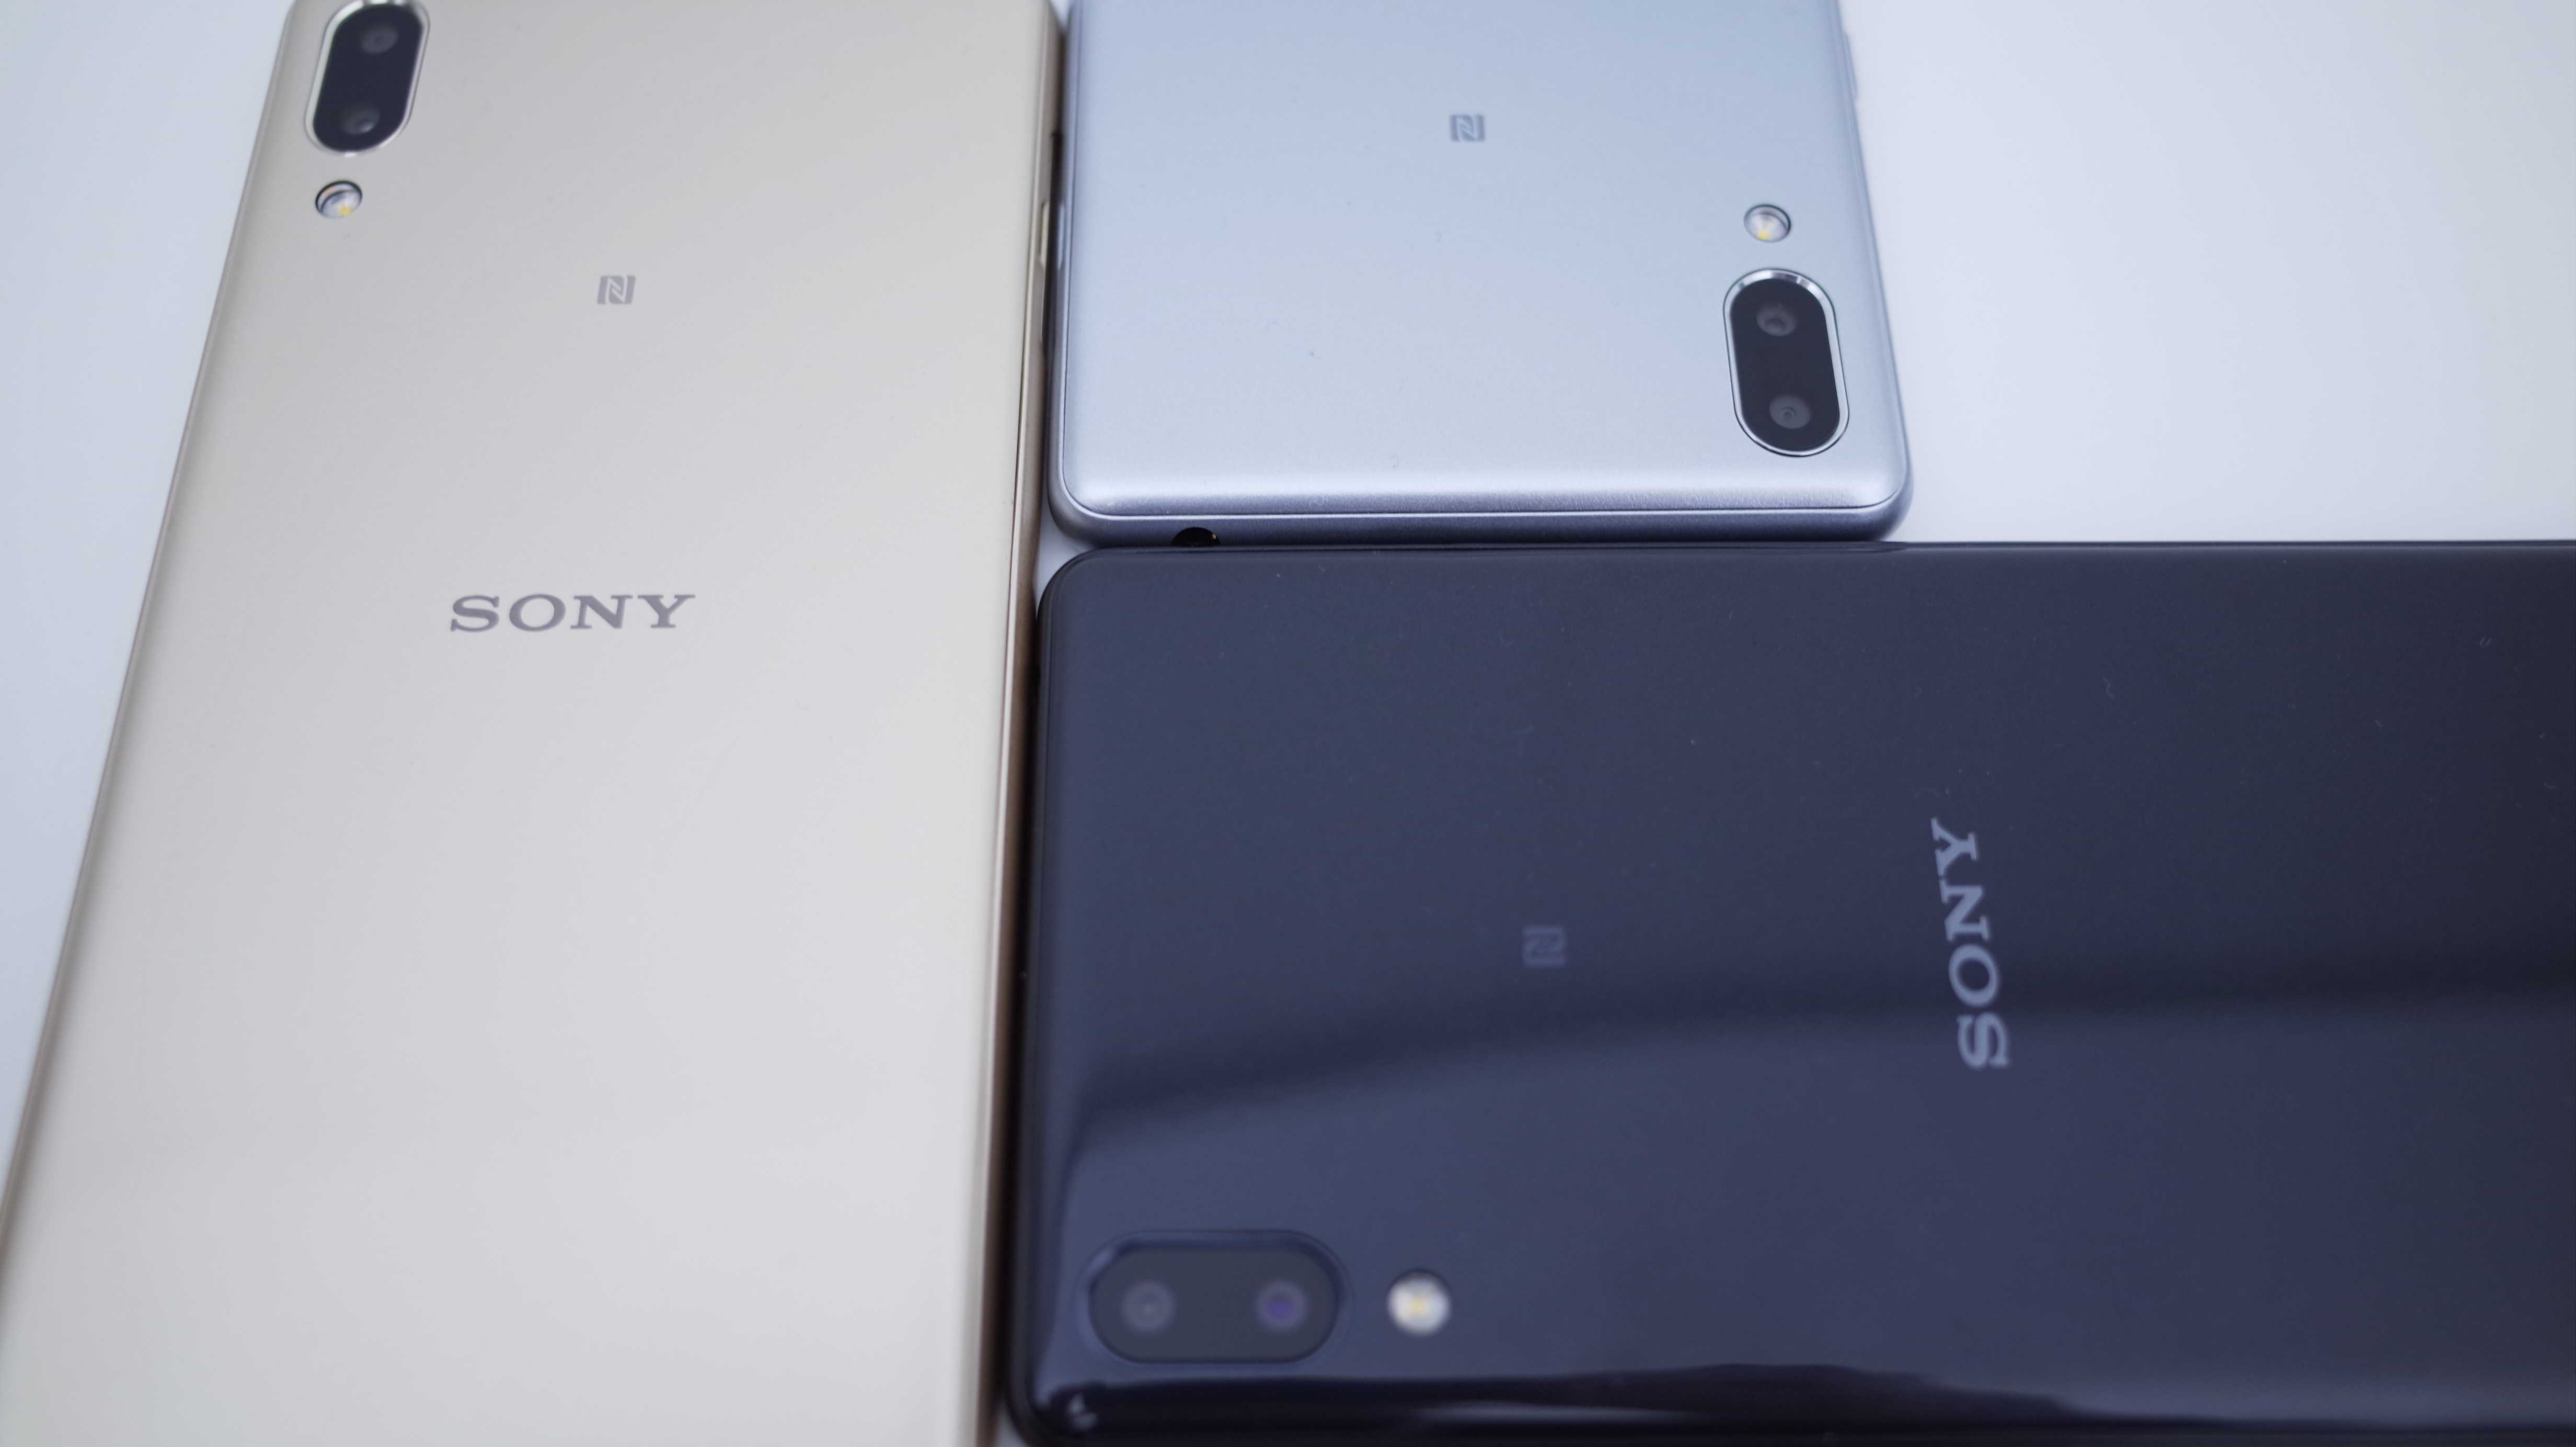 Neue Sony-Smartphones: Displays im Kinoformat und Dual-Cams